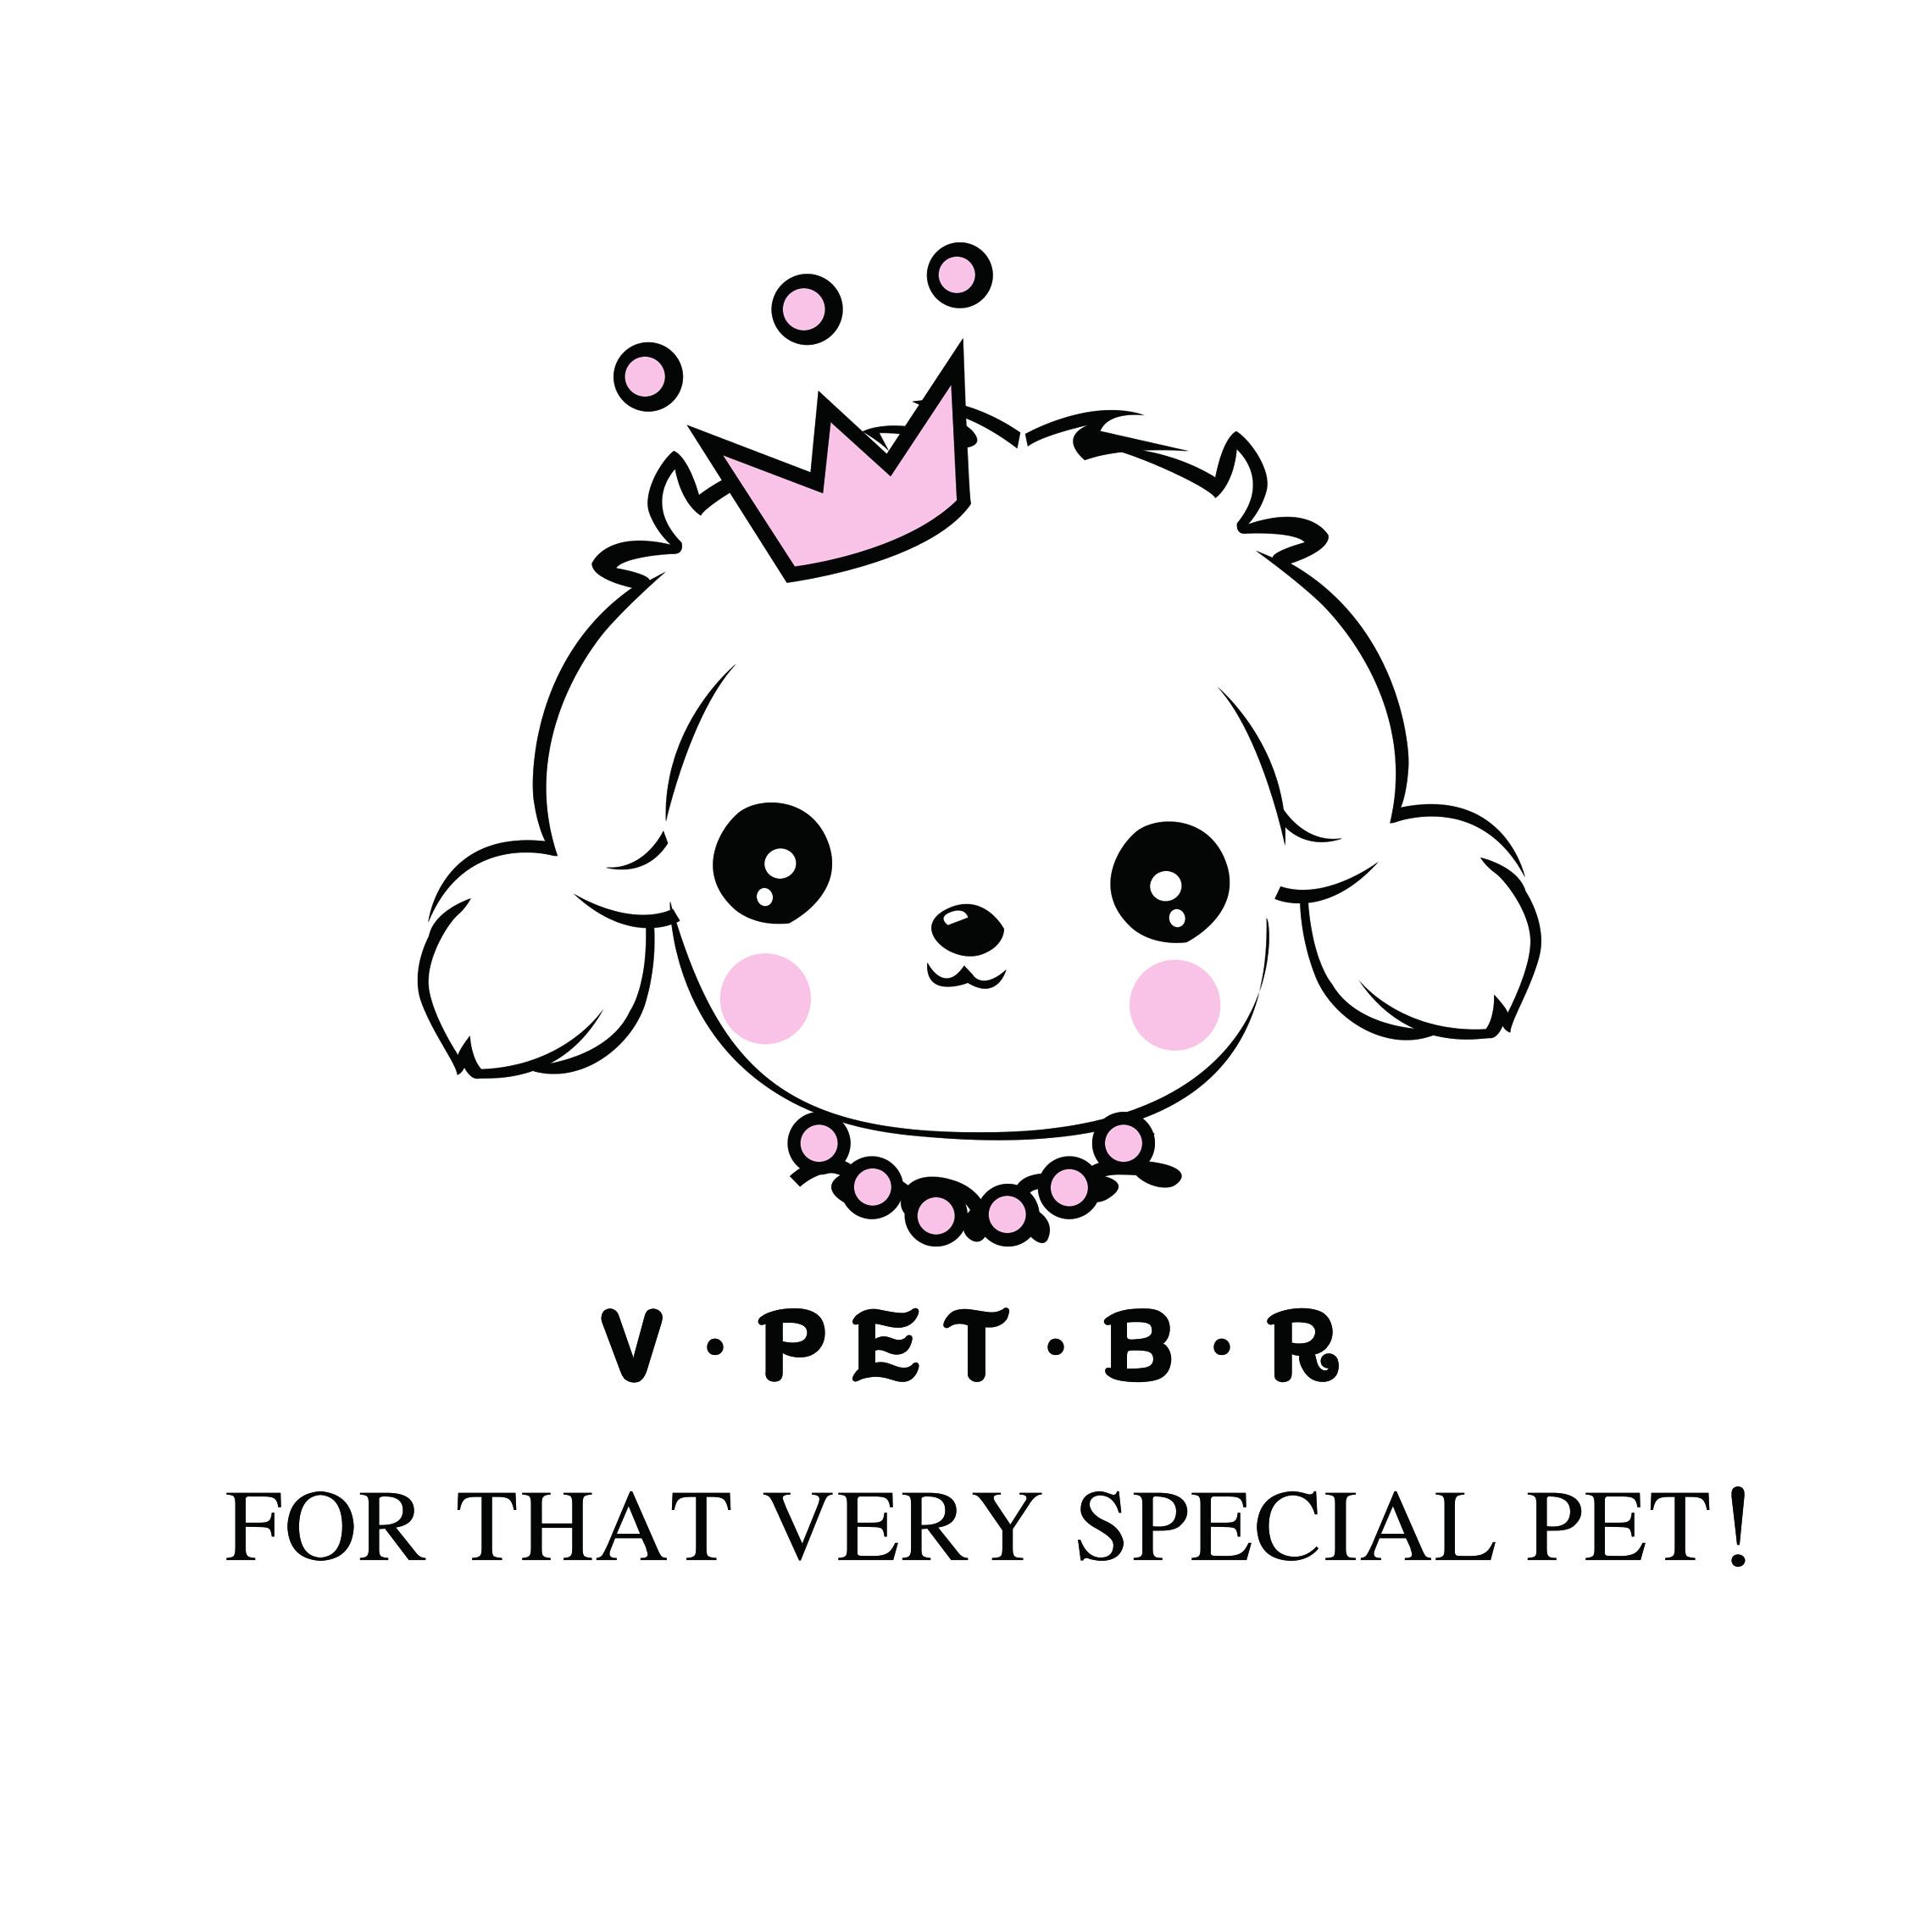 Custom Private Label Reflective Adjustable Dog Harness